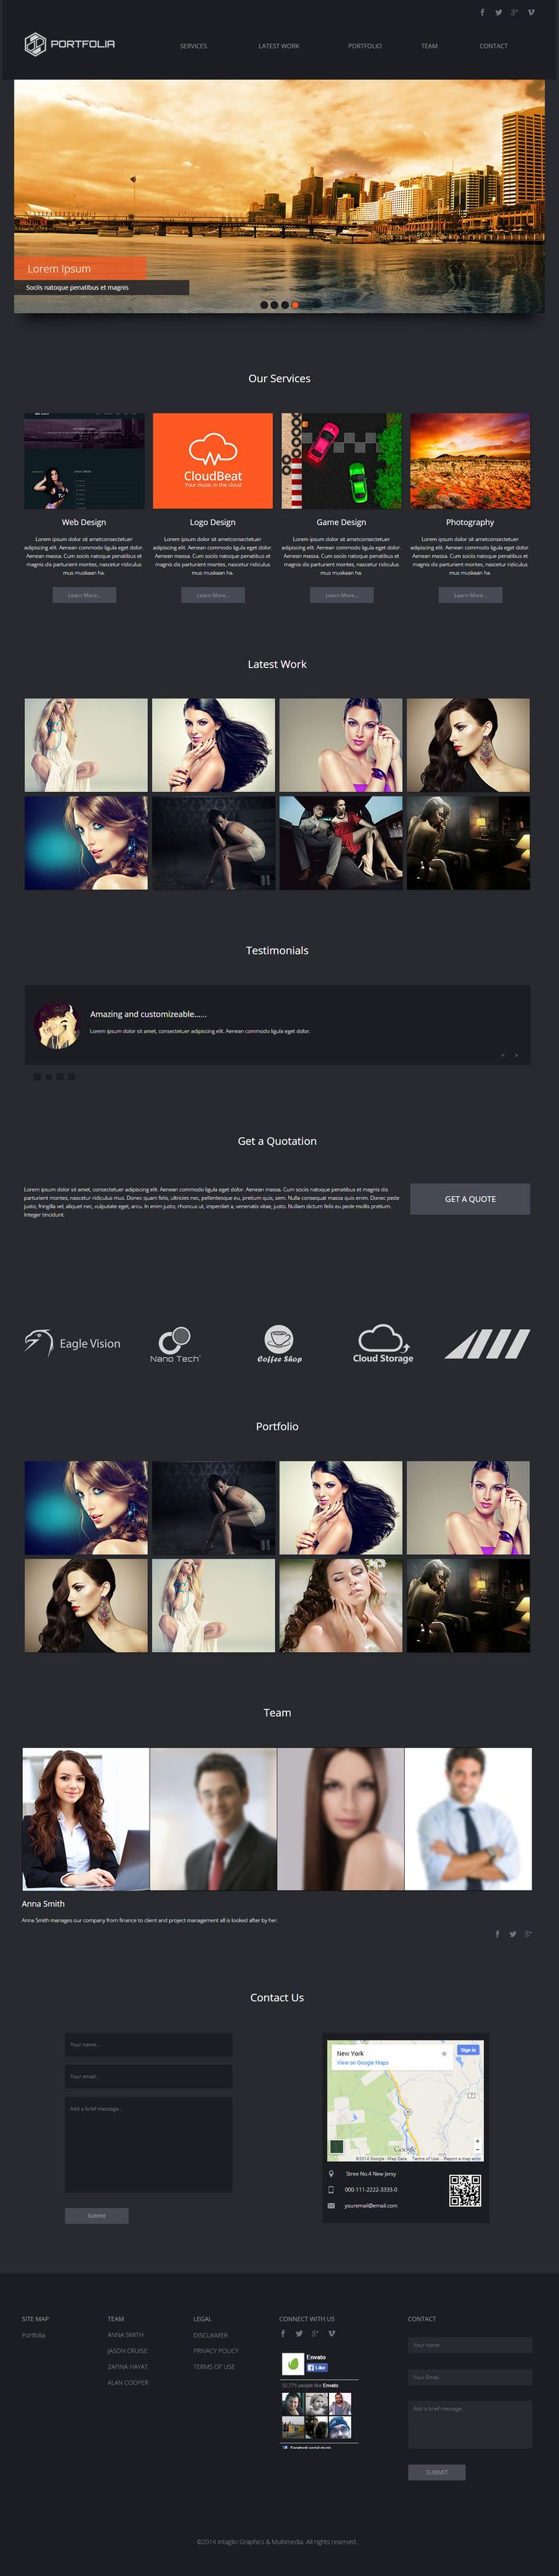 90 best Muse Templates images on Pinterest | Design websites, Site ...